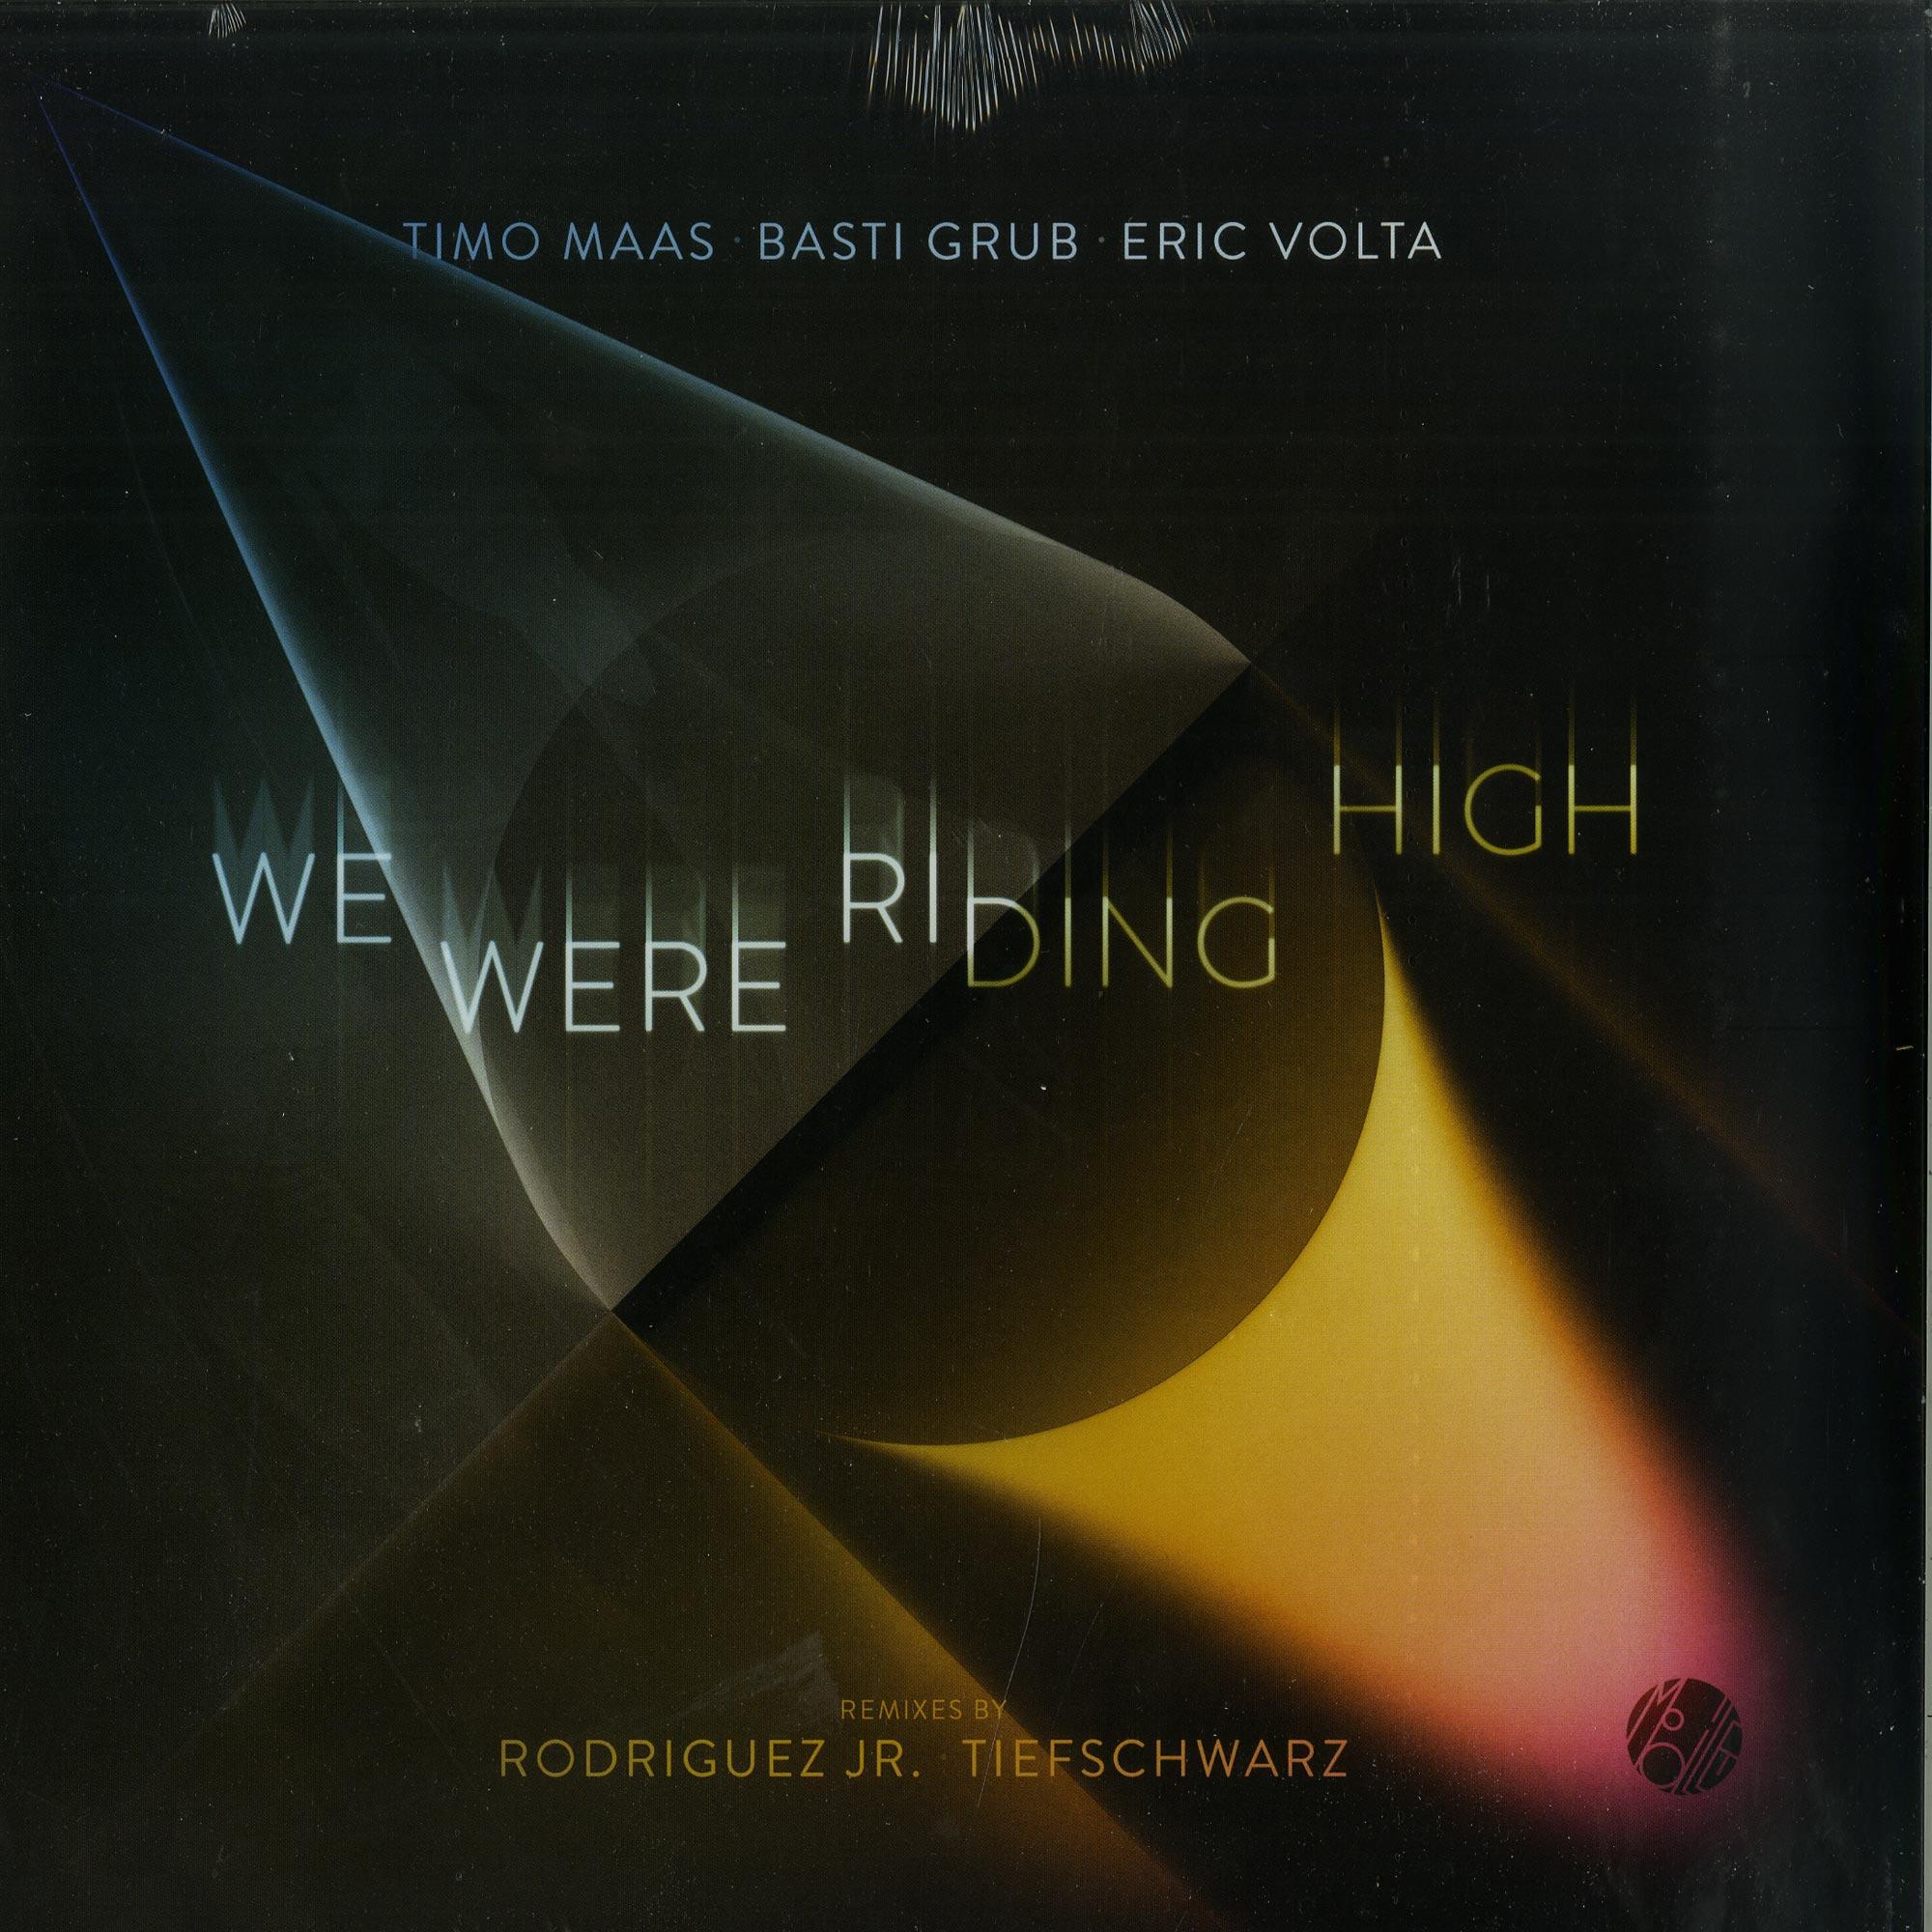 Timo Maas, Basti Grub, Eric Volta - WE WERE RIDING HIGH